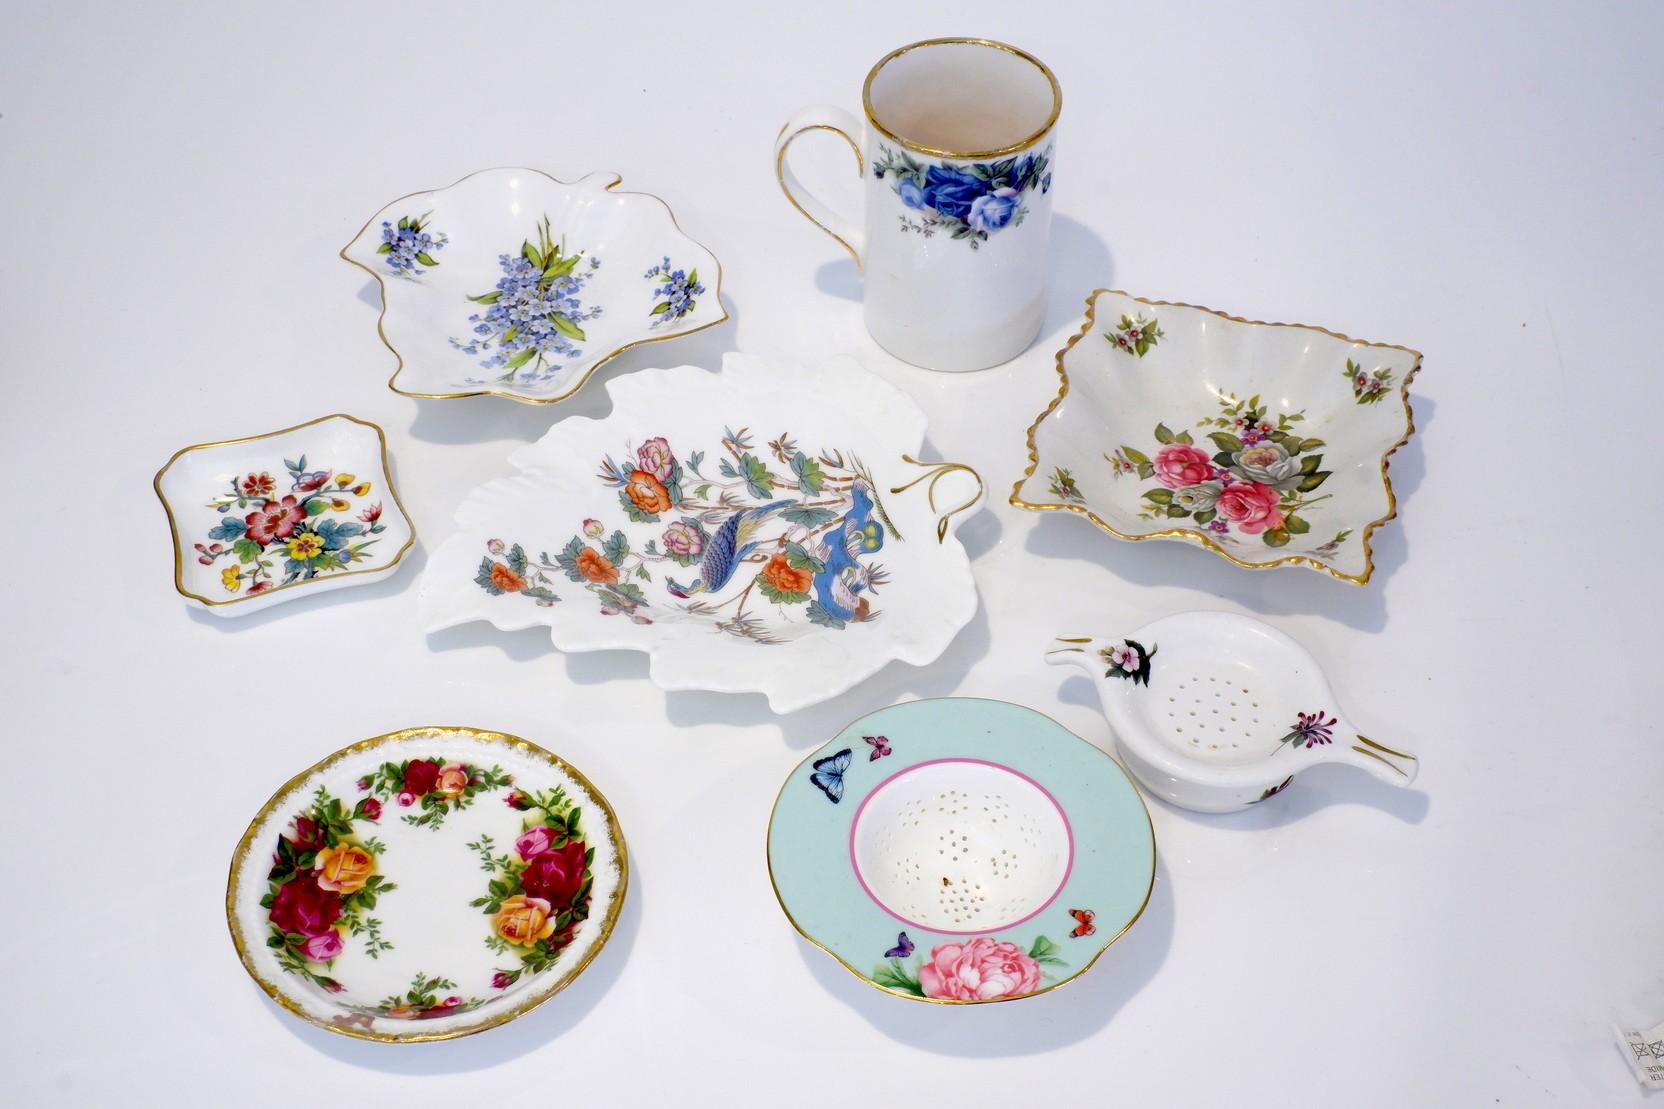 'Group of Various English Porcelain, Including Wedgwood, Royal Doulton, Royal Albert etc'